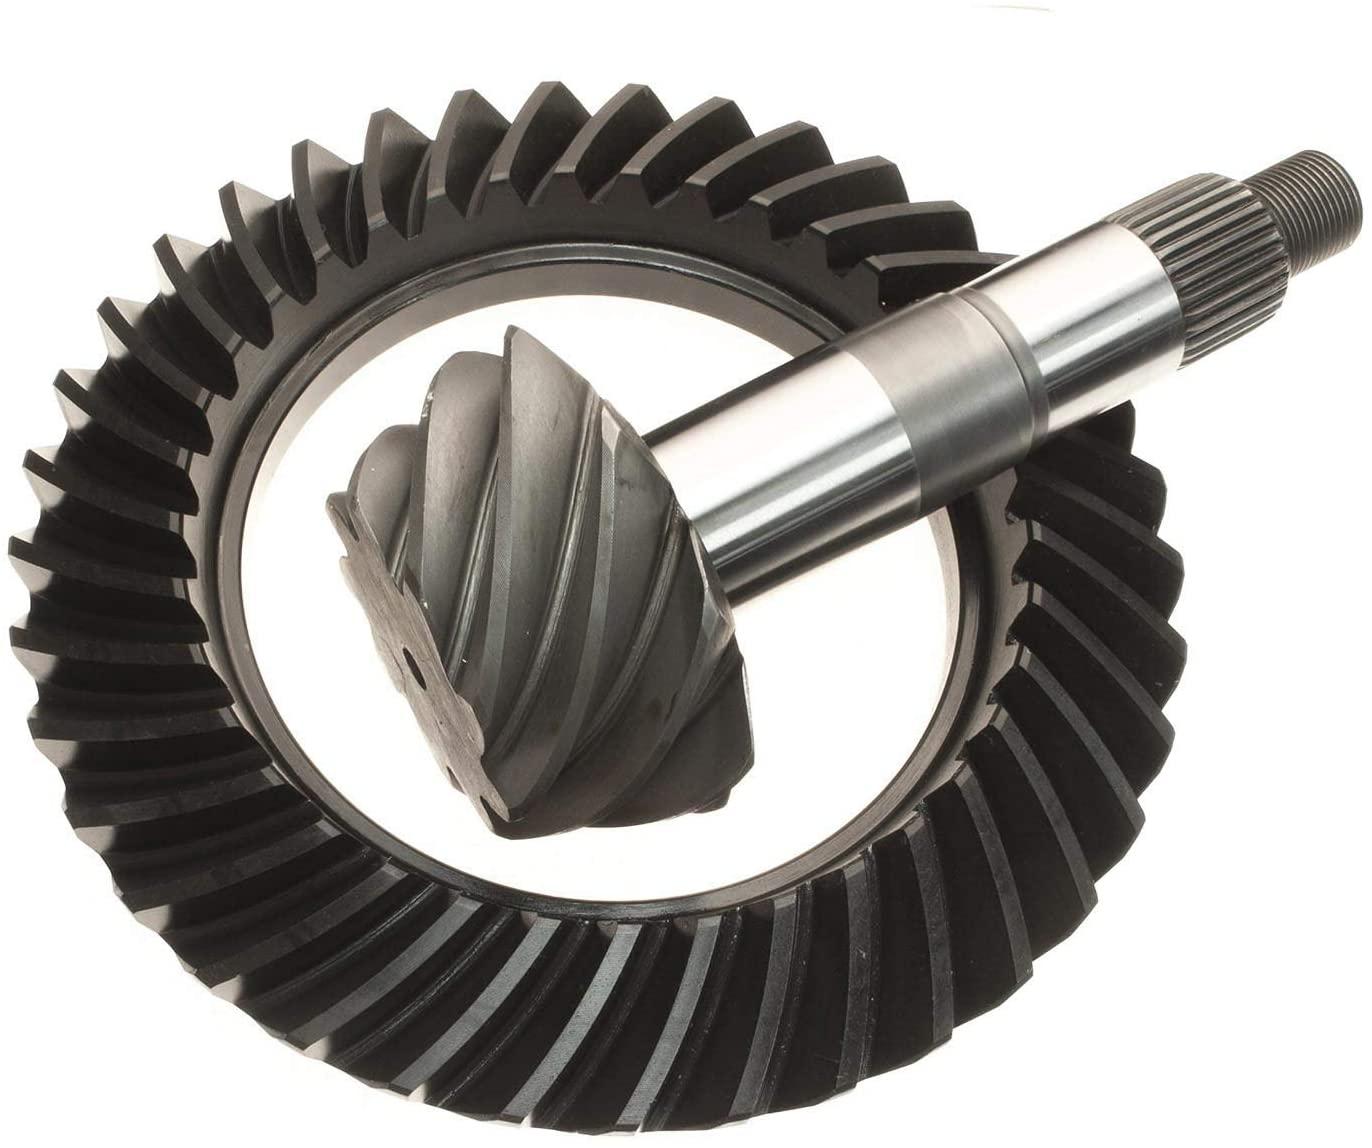 Richmond Gear 69-0204-1 Ring and Pinion GM 8.875